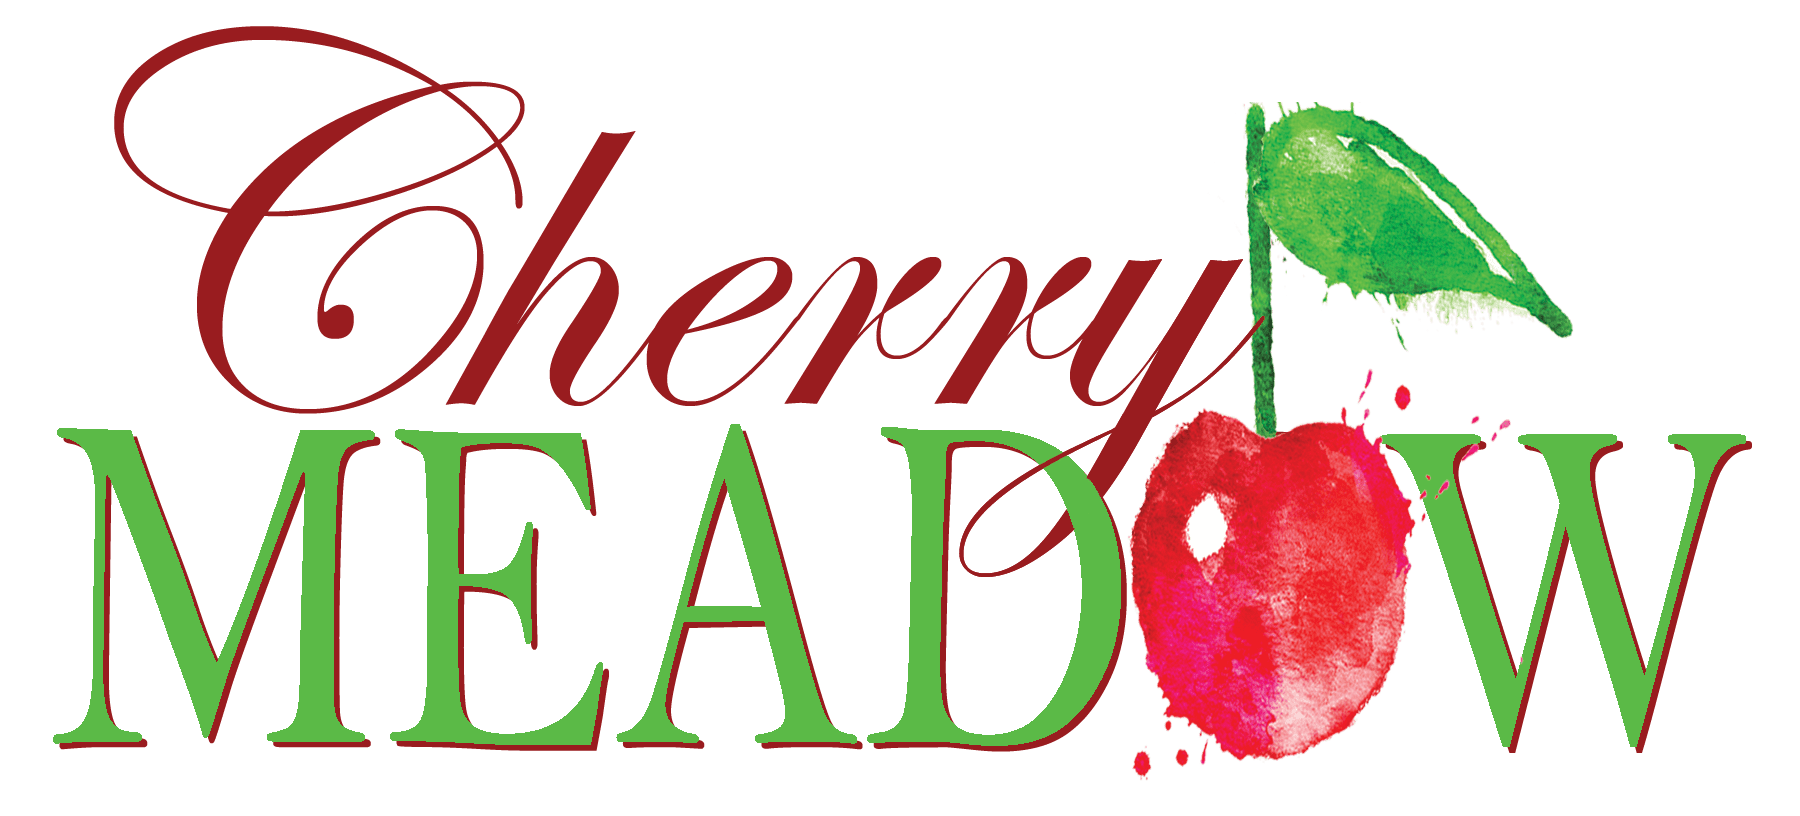 Cherry Meadow